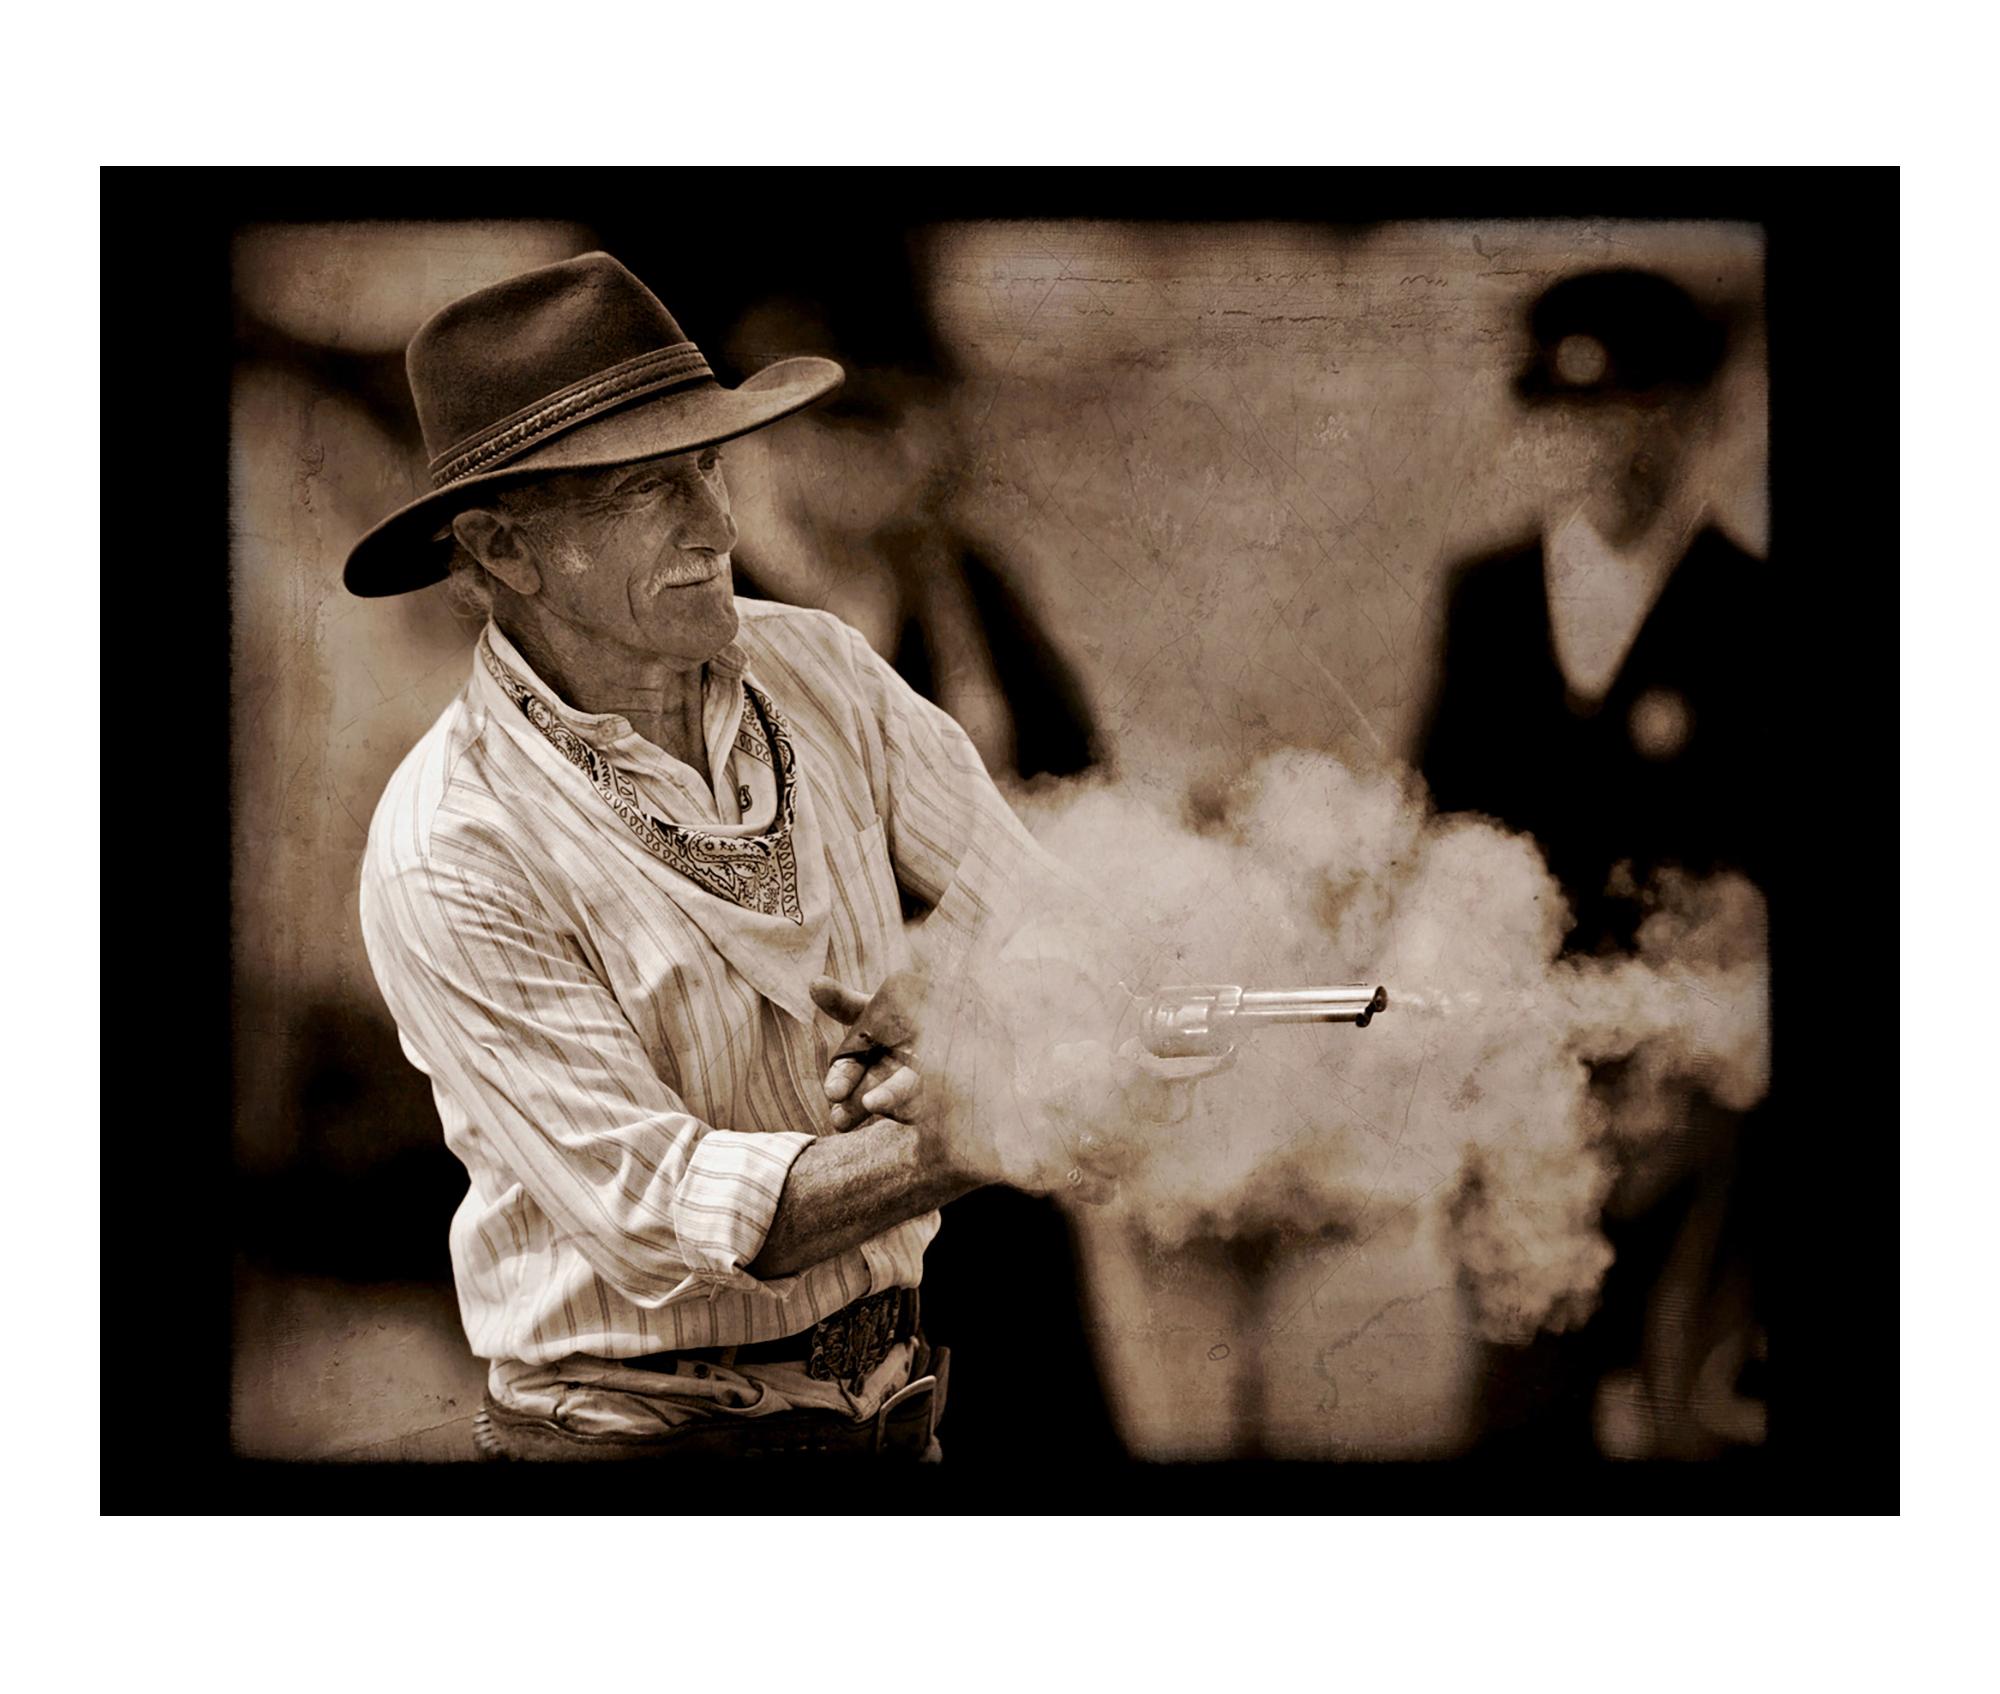 GUNFIGHTER by Paul Colella S1 copy